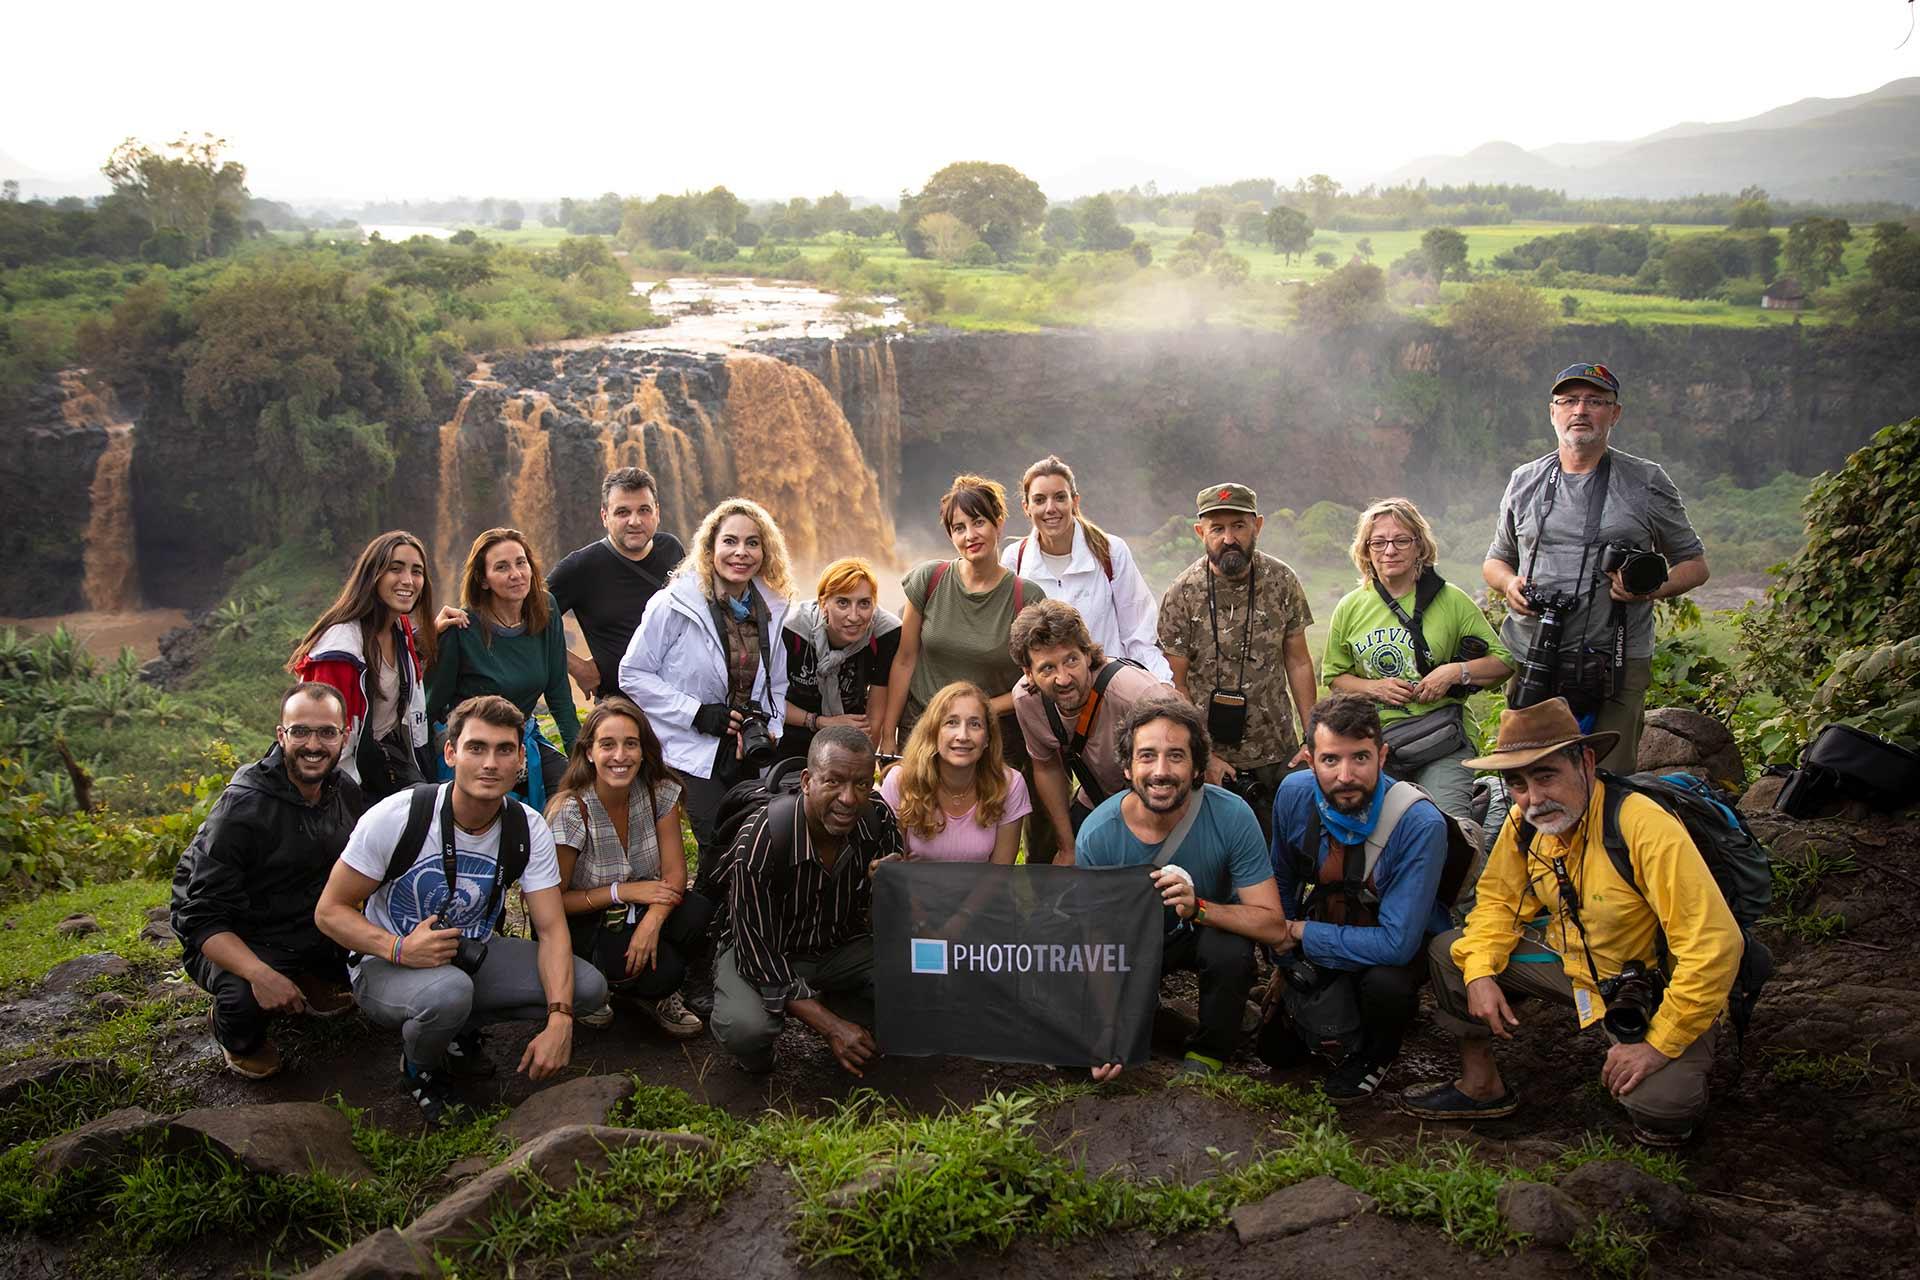 viaje-fotografico-etiopia-sede